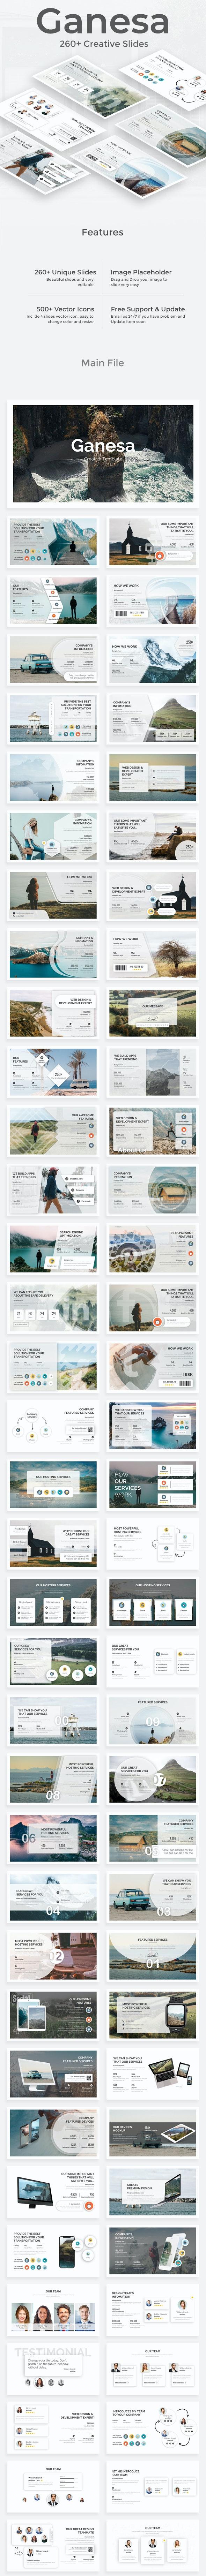 Ganesa Premium Keynote Template - Creative Keynote Templates